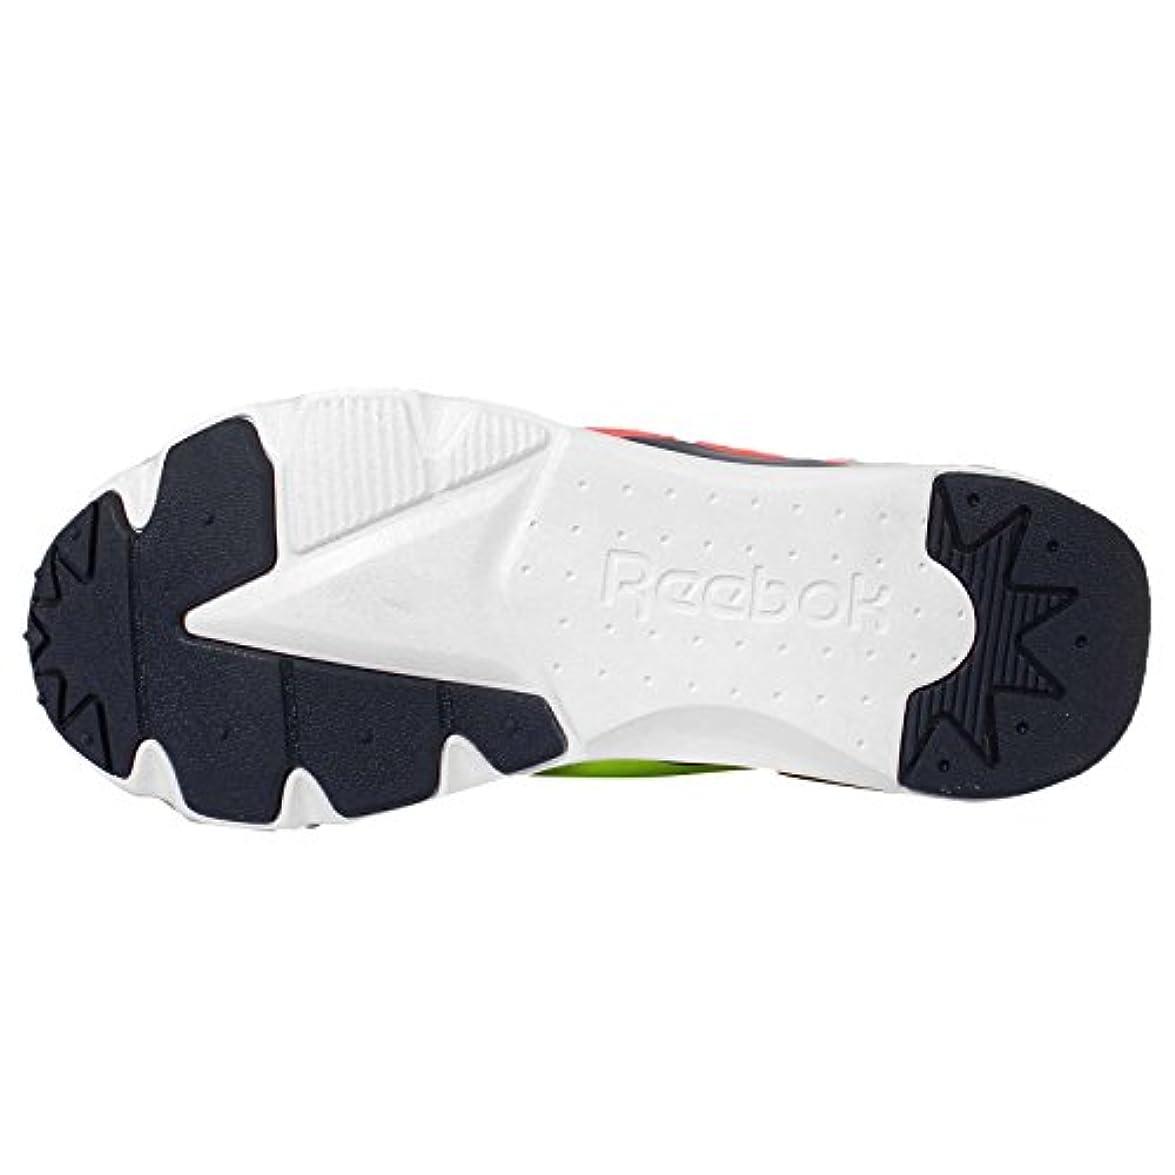 Donna Reebok Furylite Asymmetrical Sneakers Fluogiallo Fluo